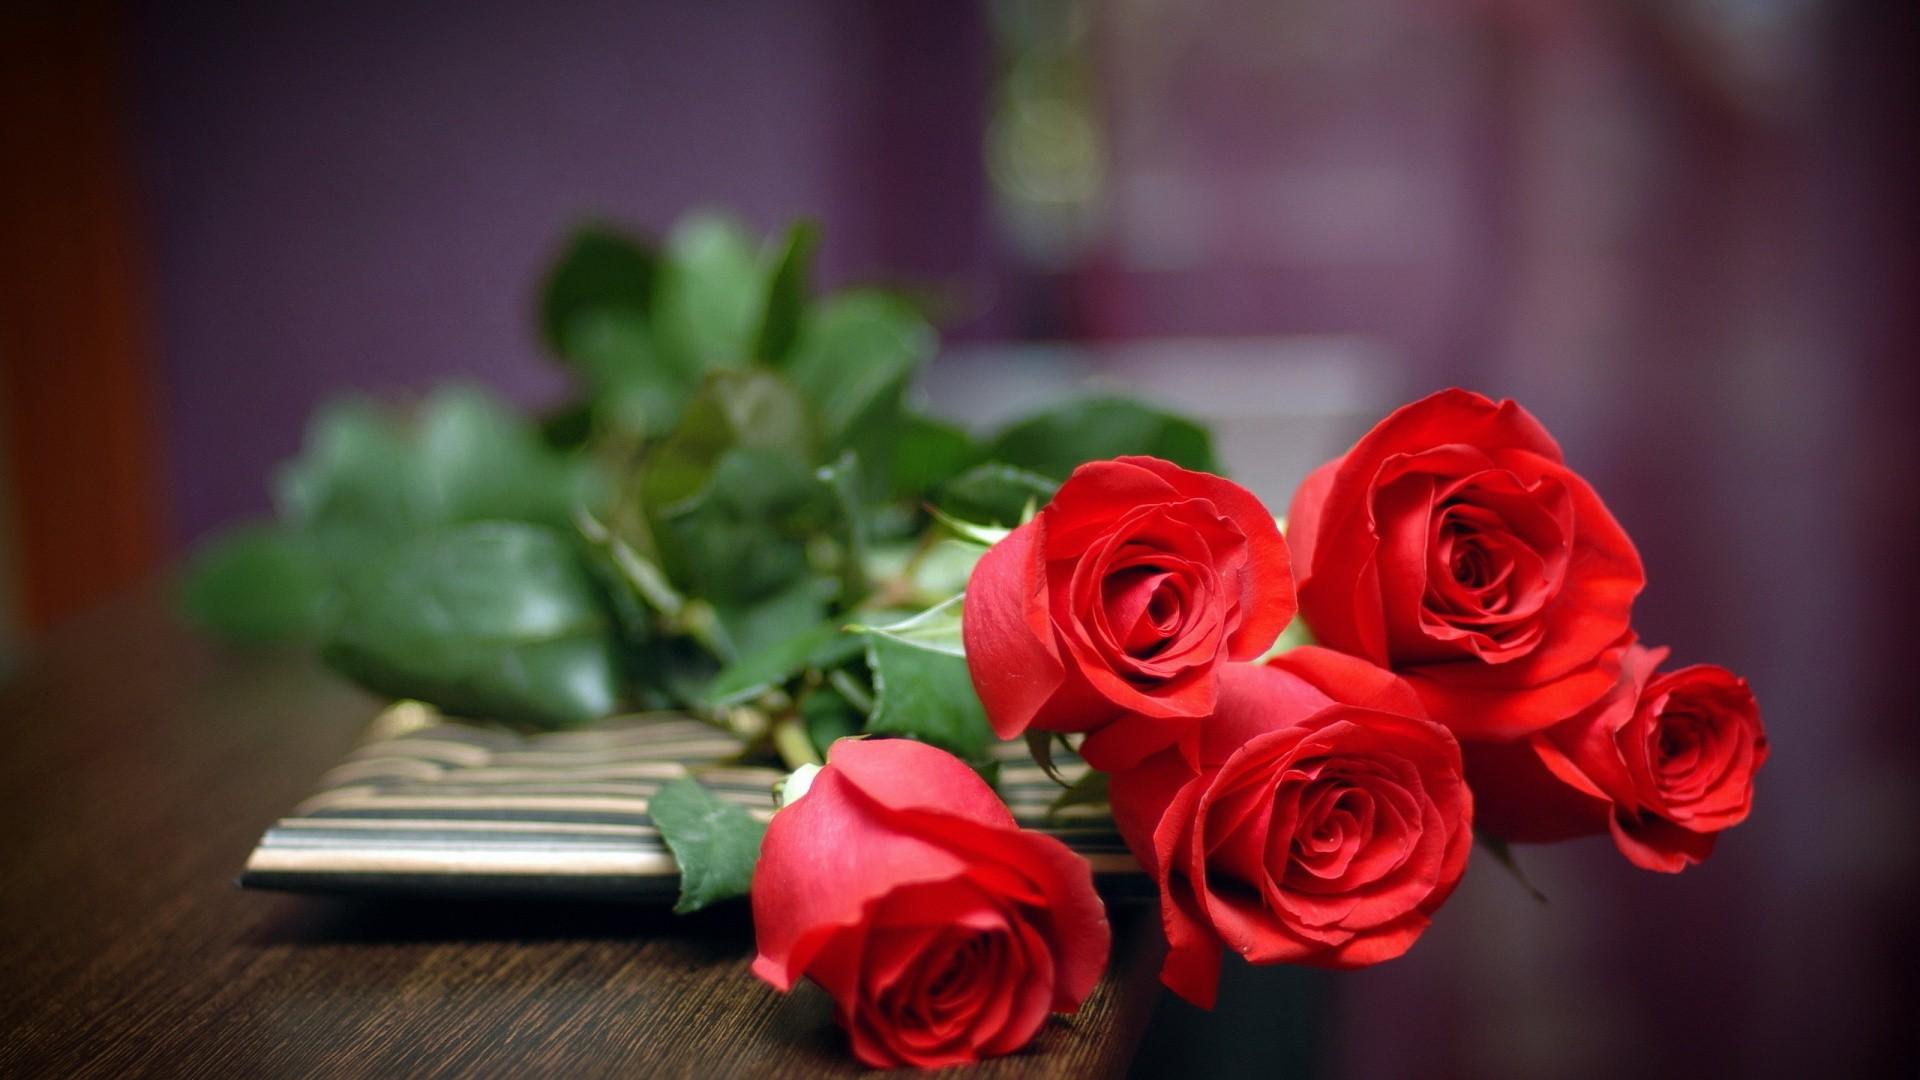 , rose, flower, desktop, awesome, windows, photos fond ecran hd